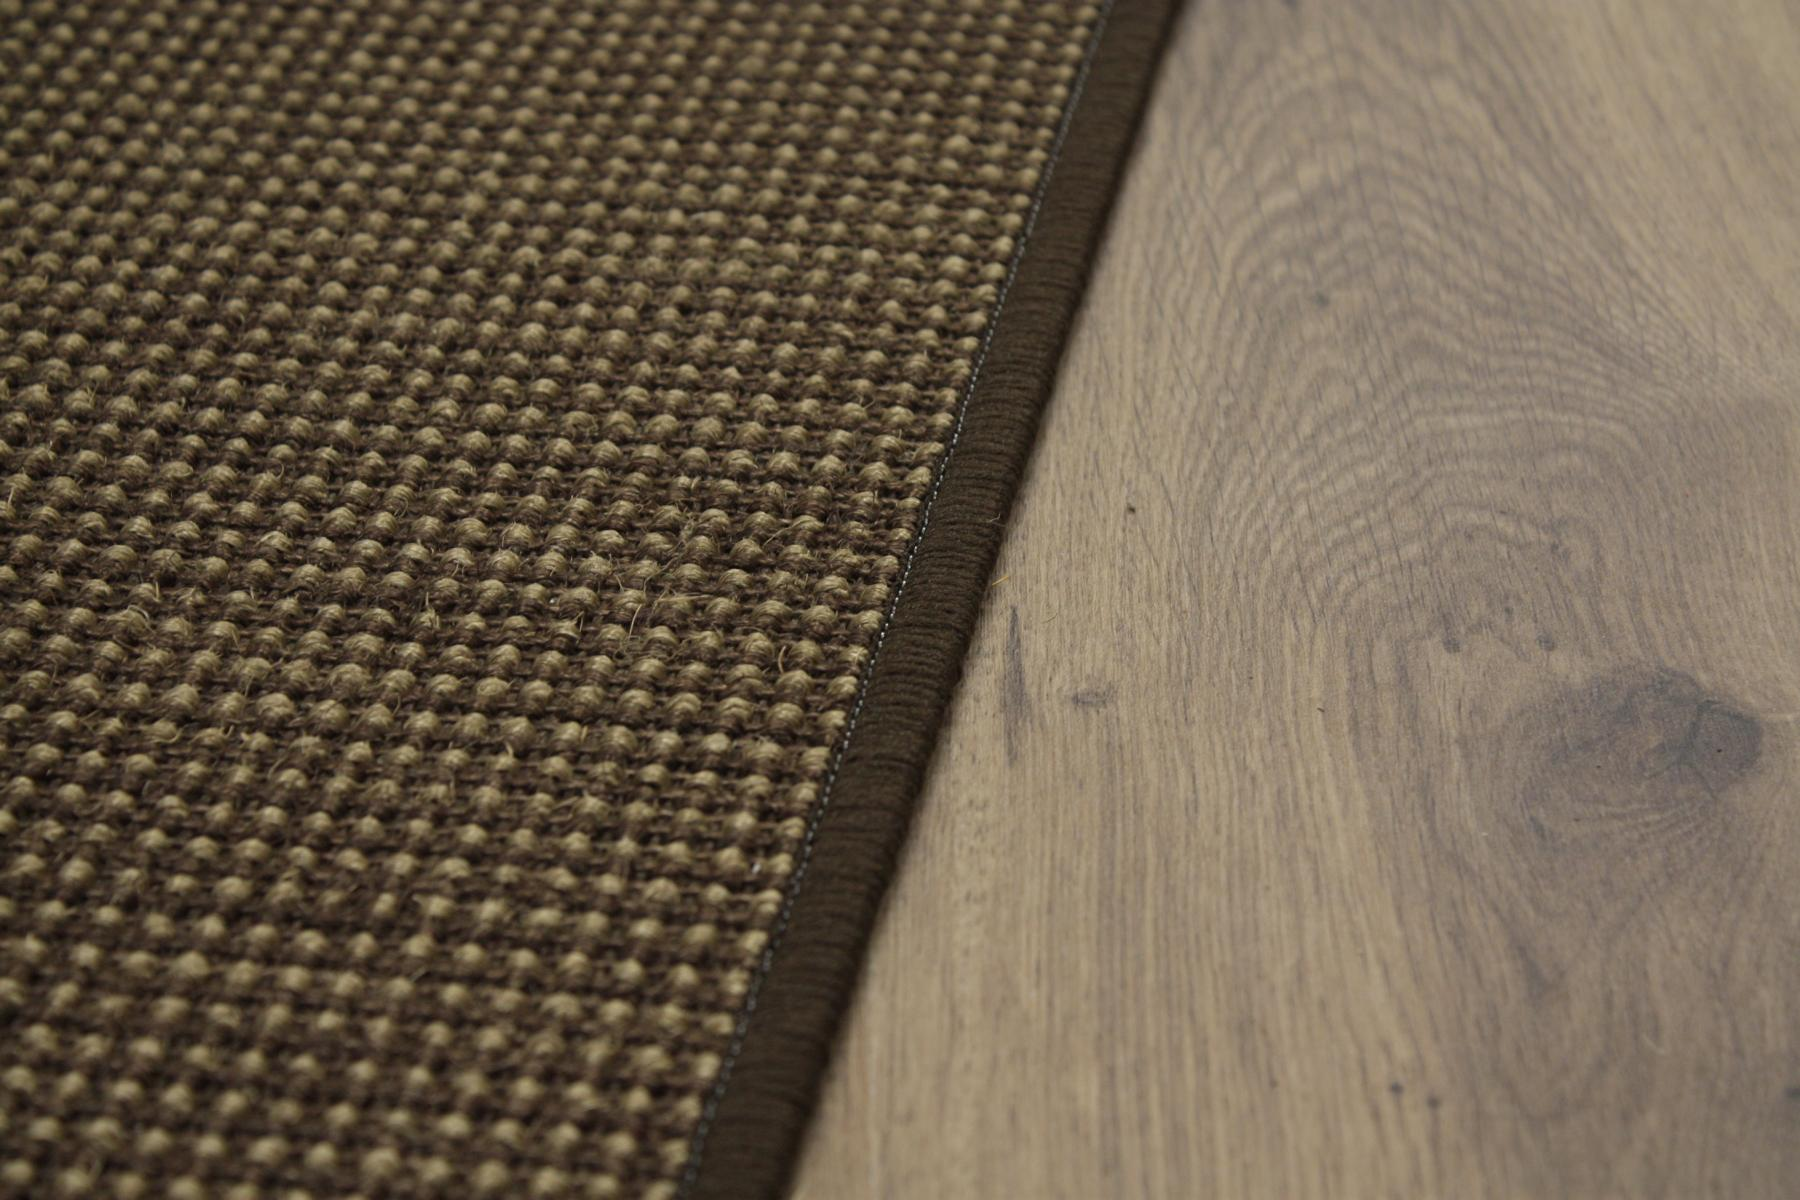 sisal katzen kratzmatte kratzbrett 60x90cm gemustert. Black Bedroom Furniture Sets. Home Design Ideas